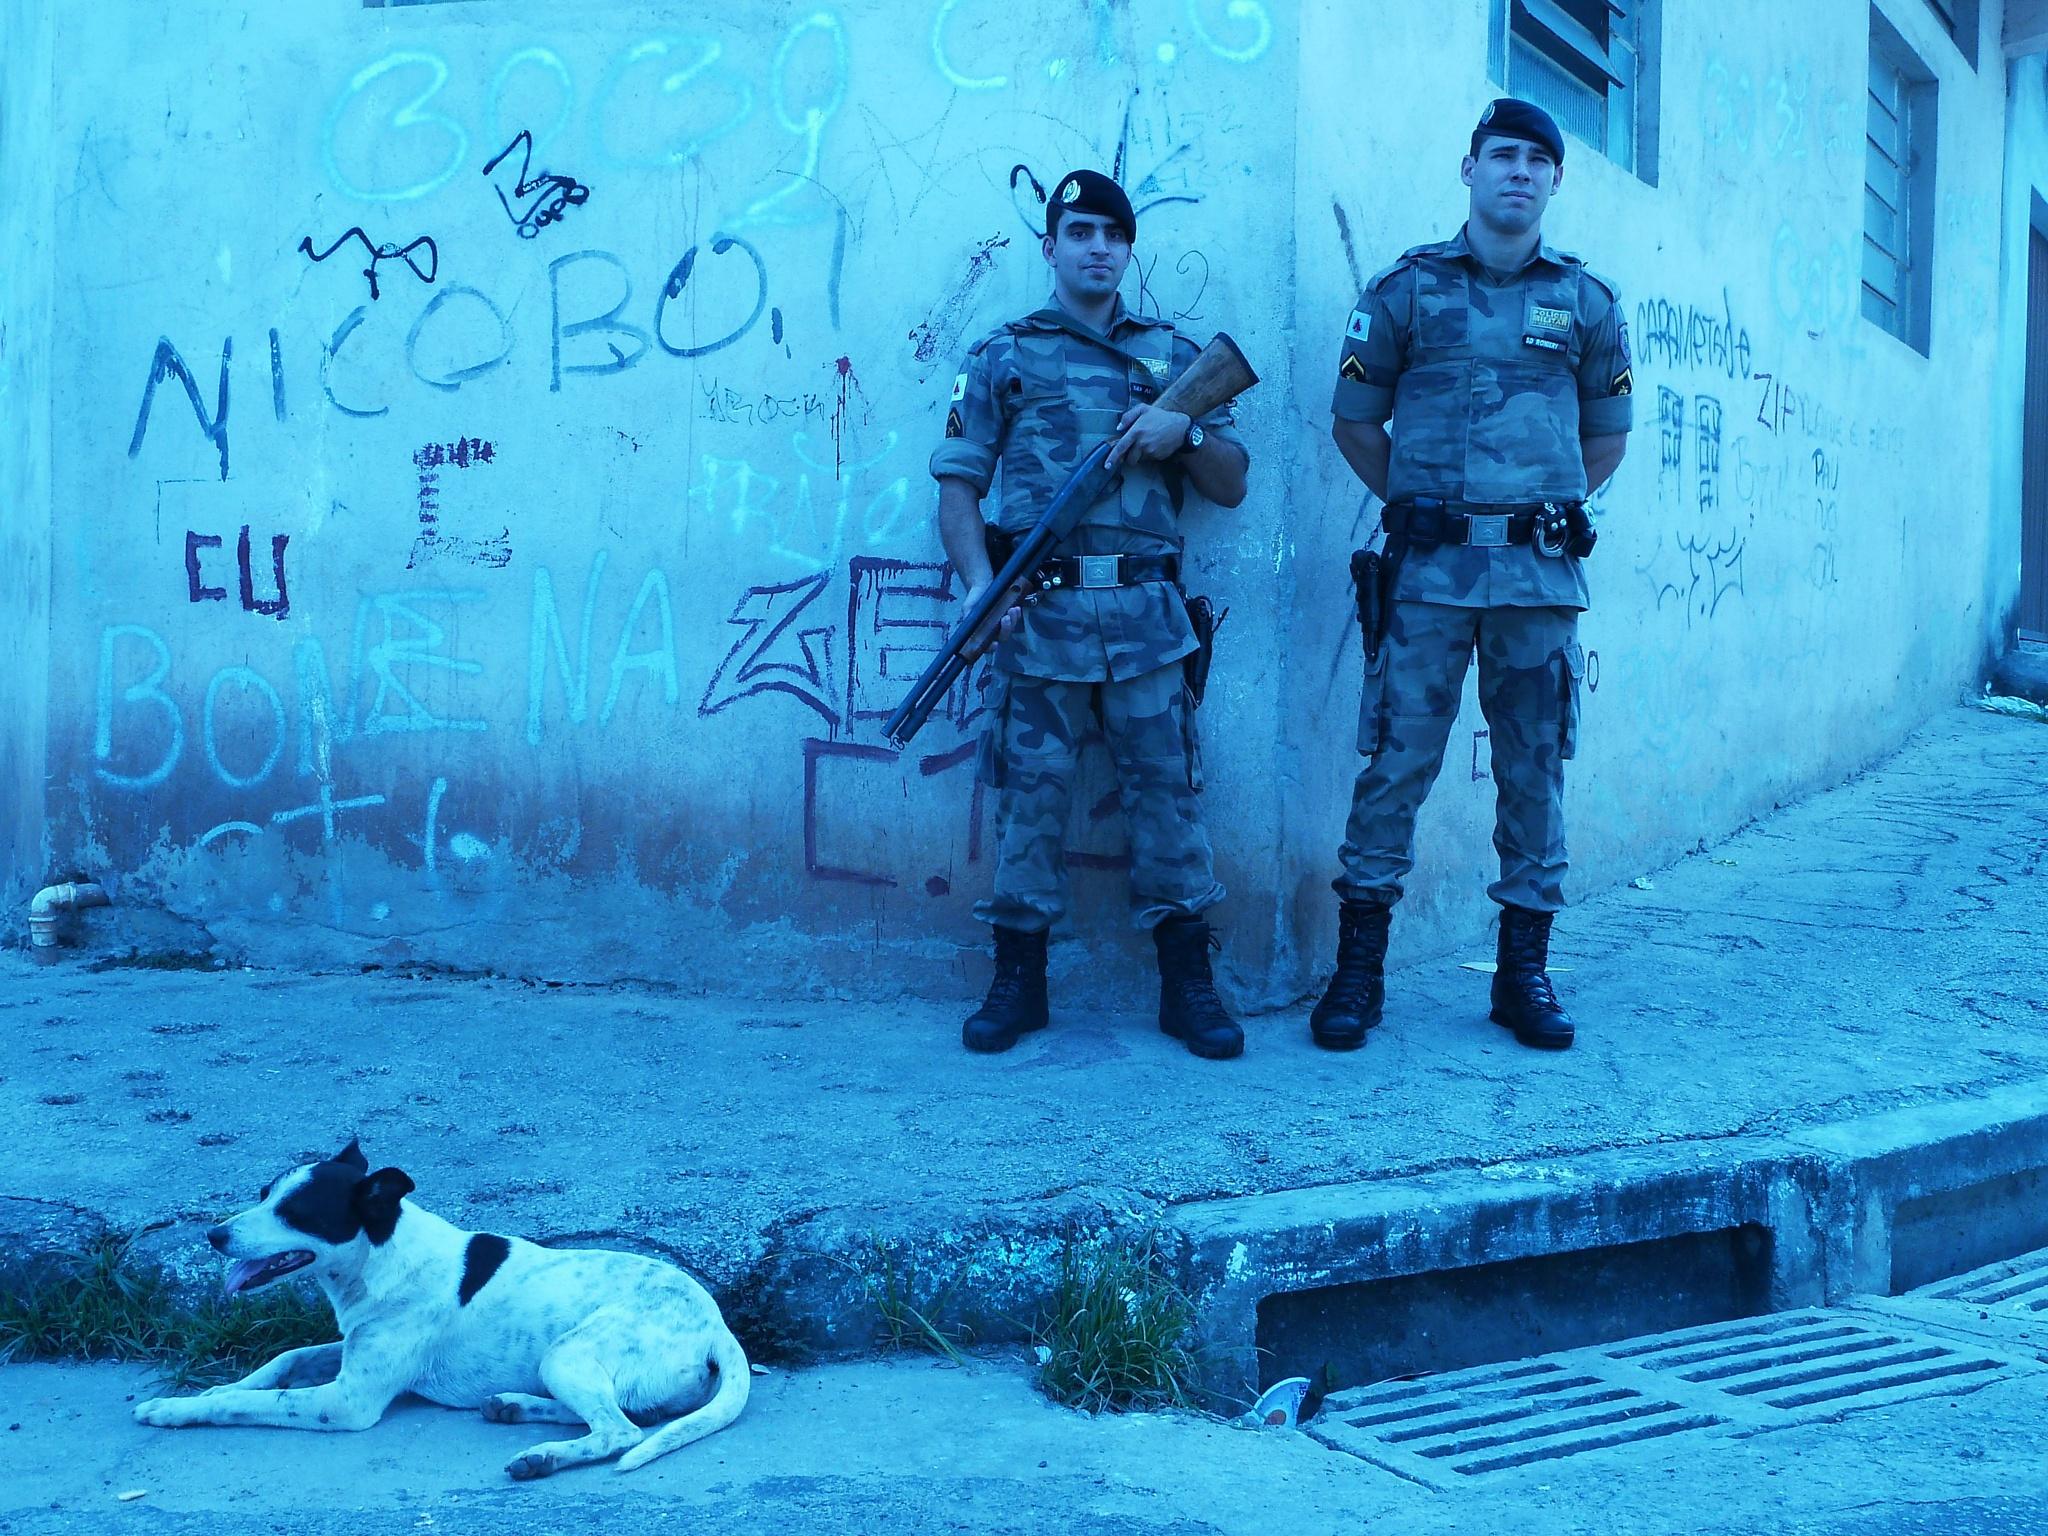 Favela by FredWillem